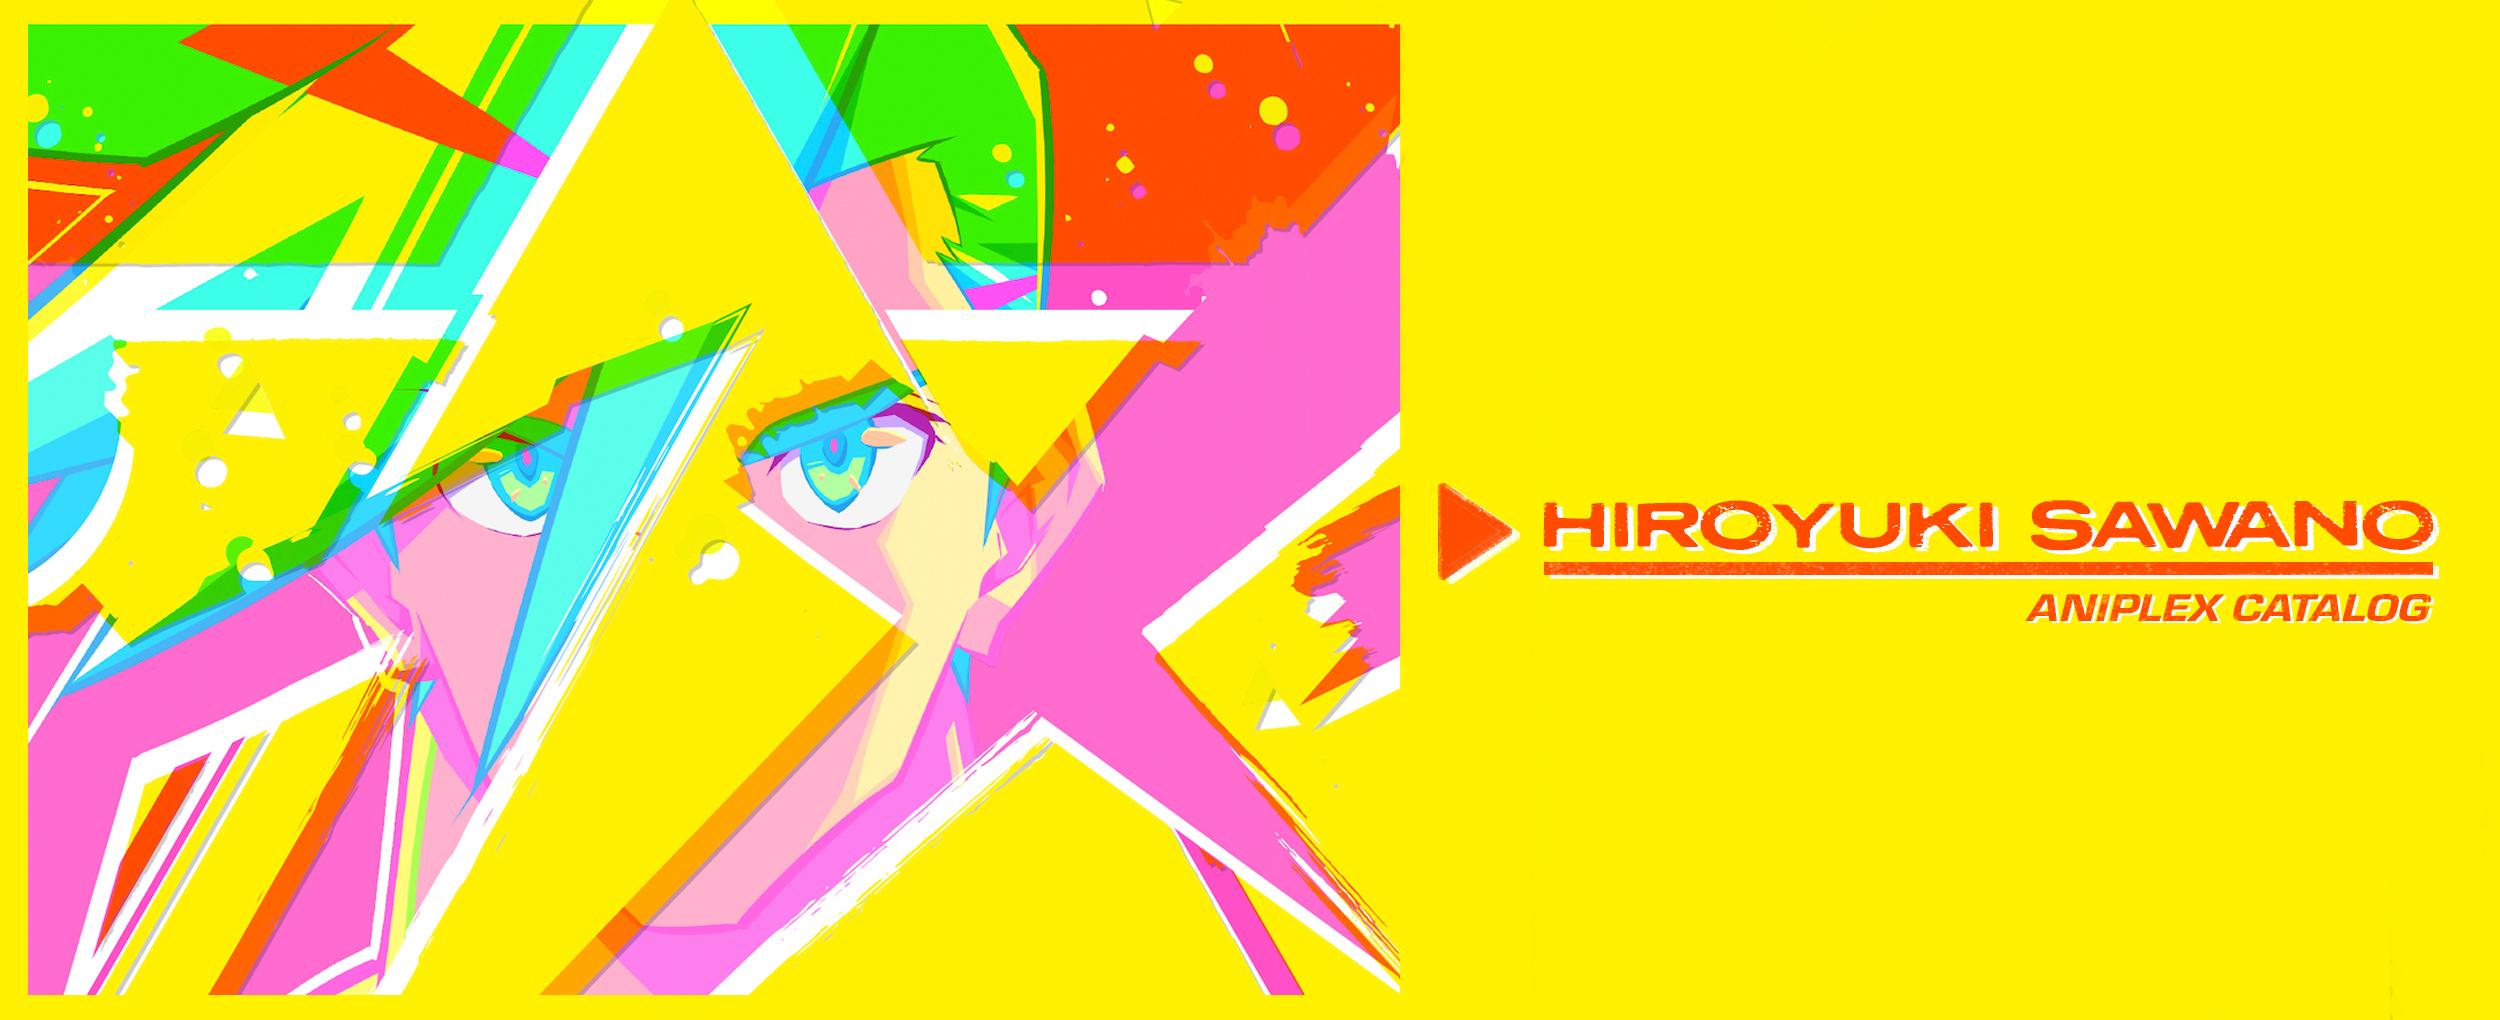 Hiroyuki Sawano • Aniplex Catalog